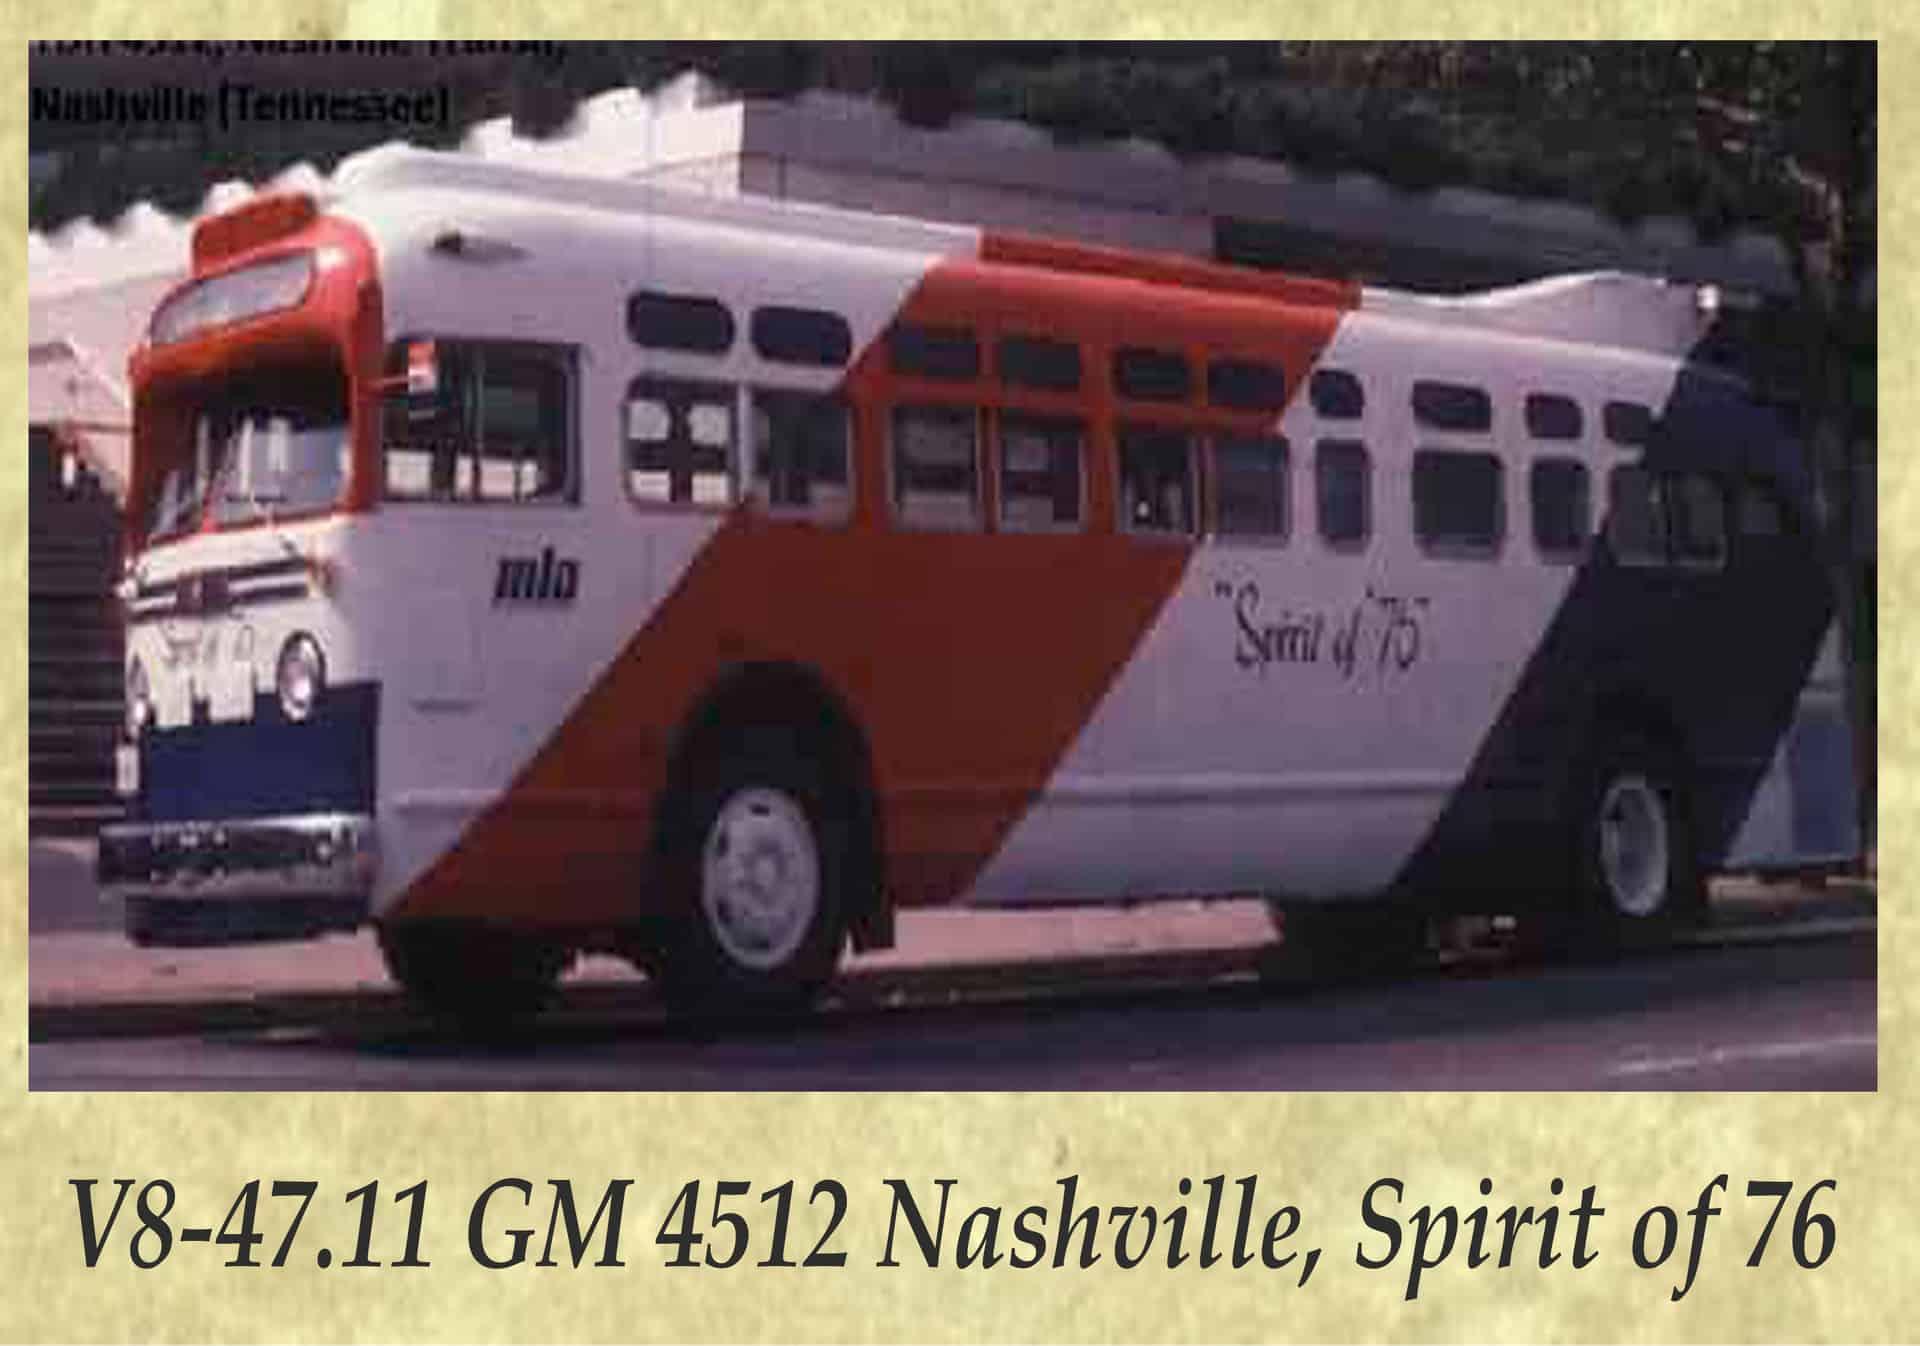 V8-47.11 GM 4512 Nashville, Spirit of 76